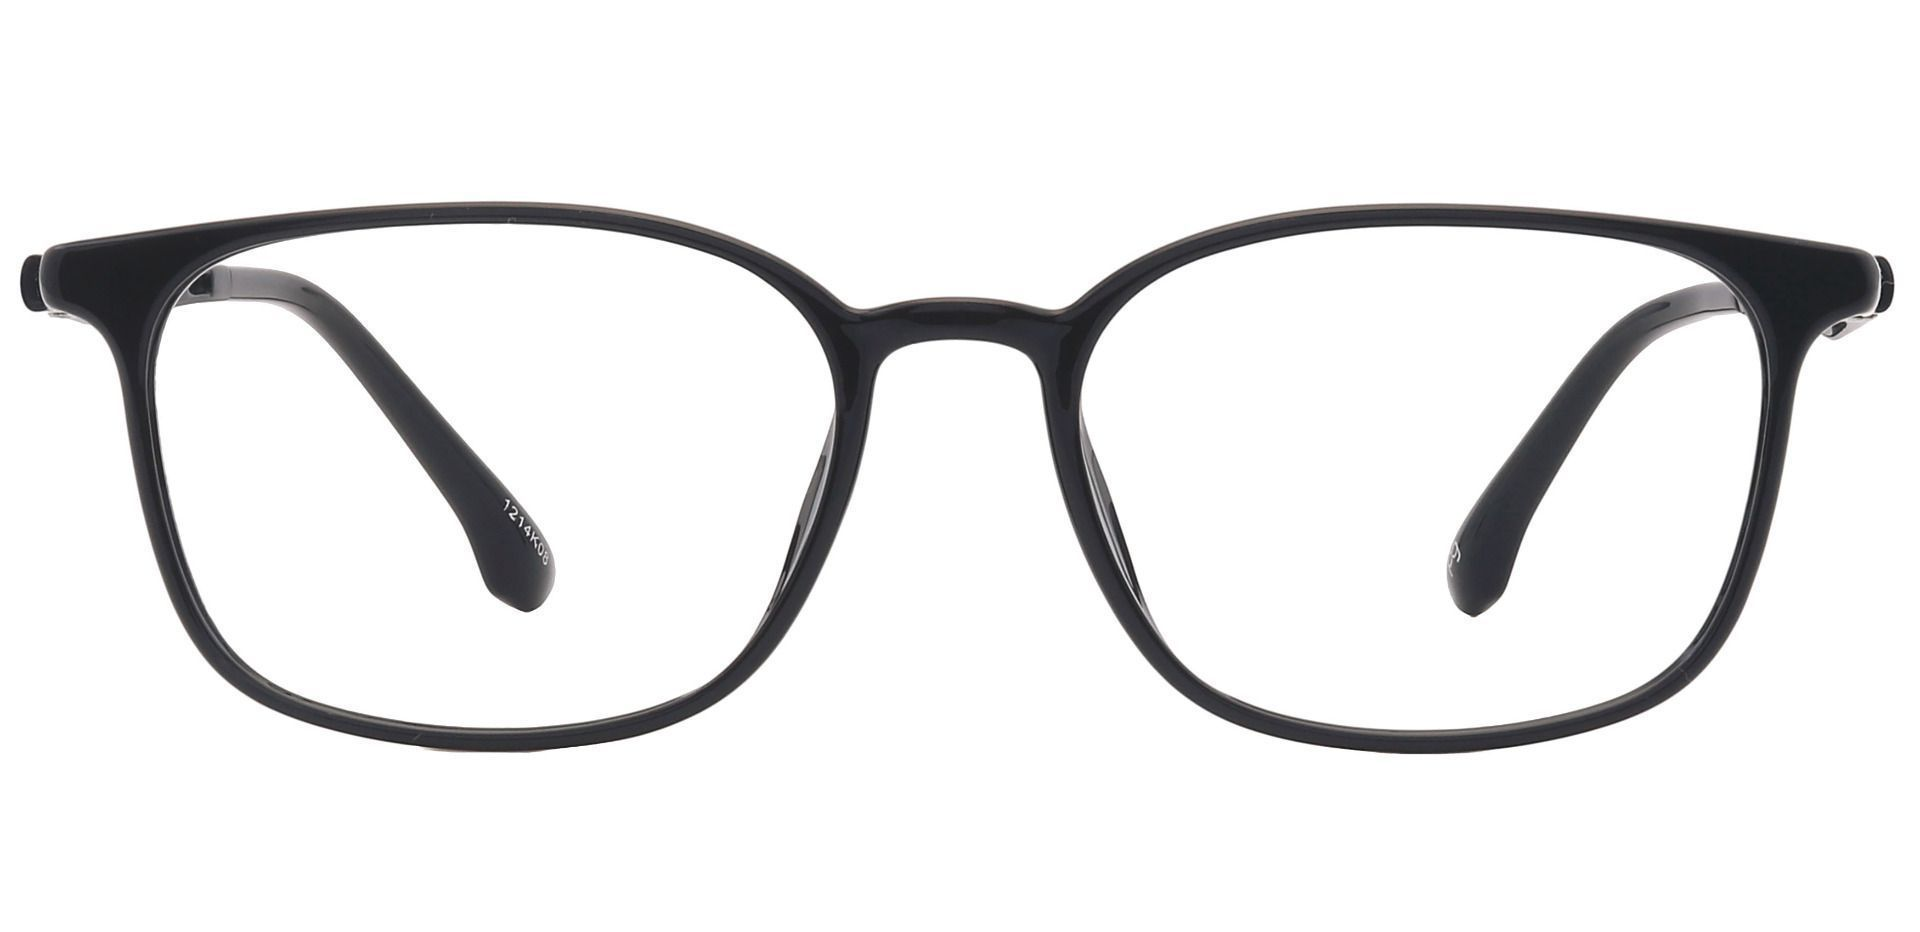 Plateau Oval Prescription Glasses - Black